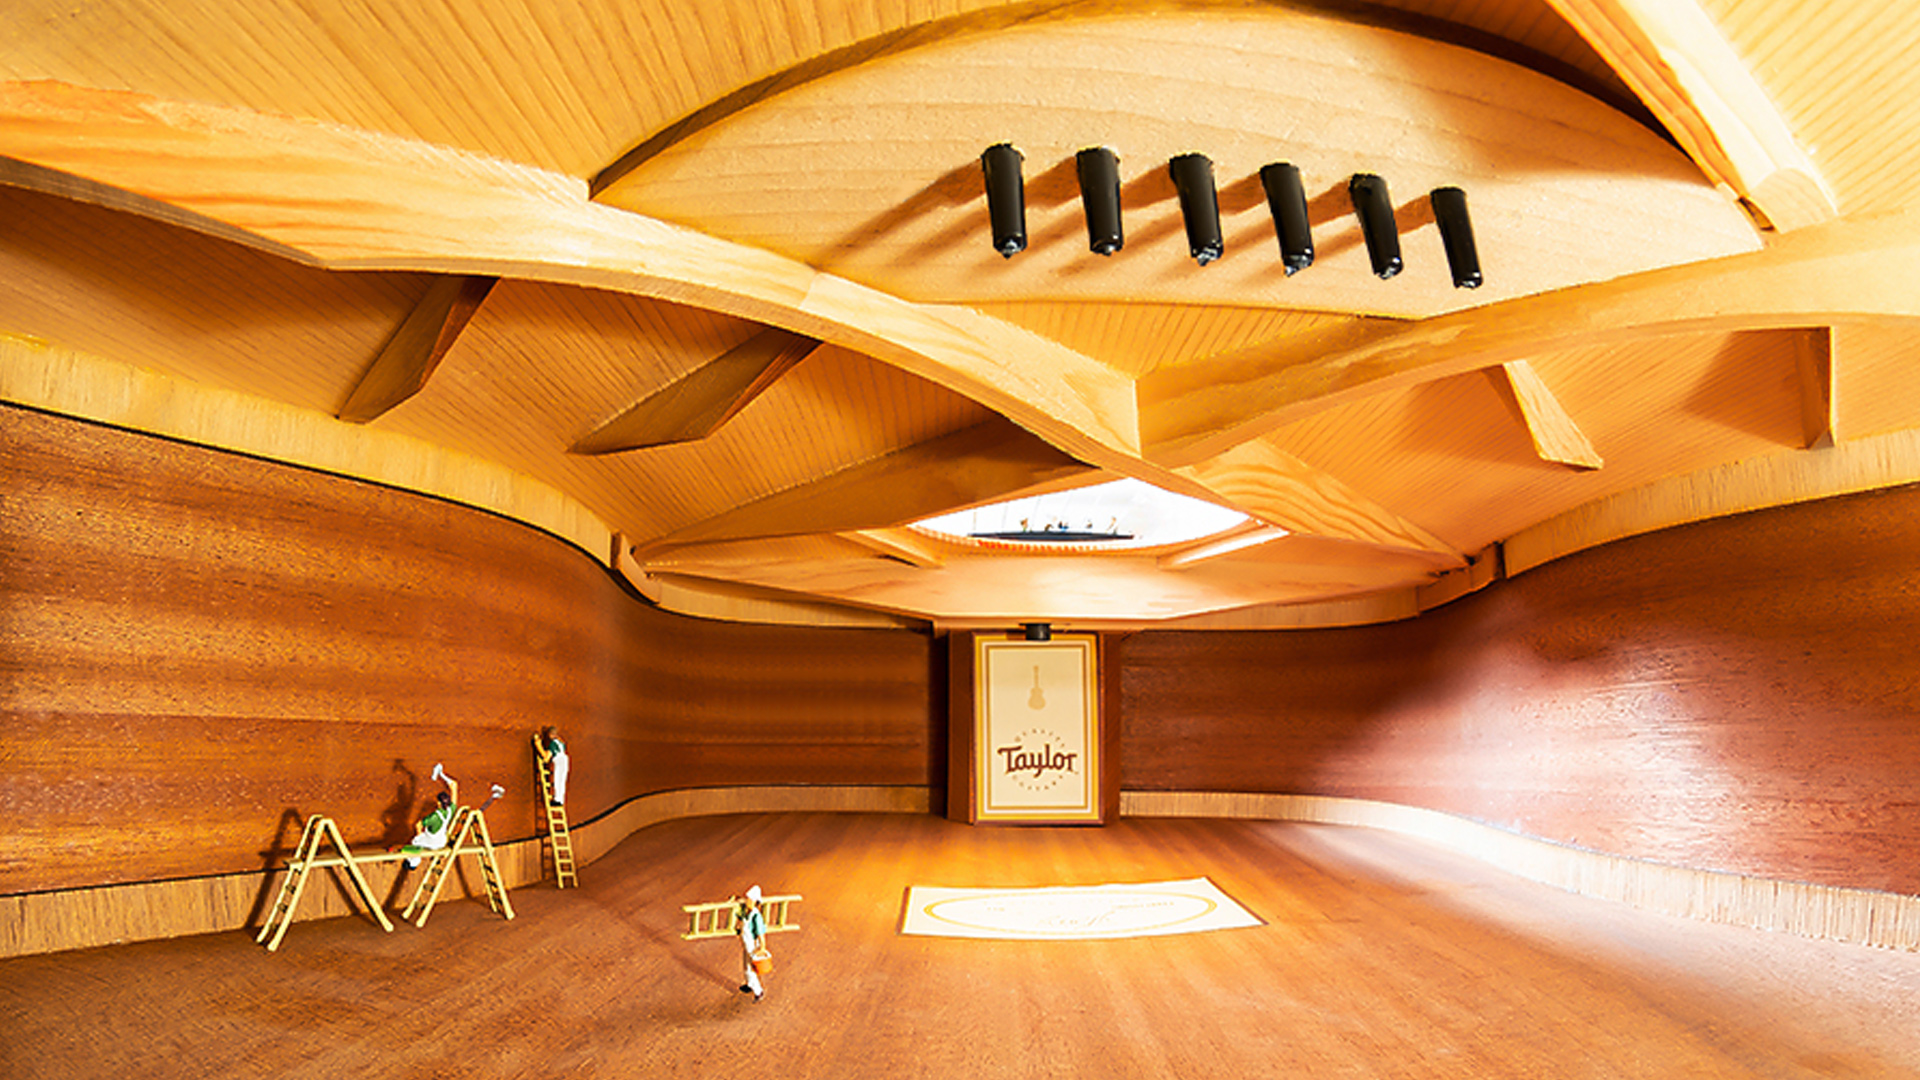 interior still-life photo of Taylor acoustic guitar